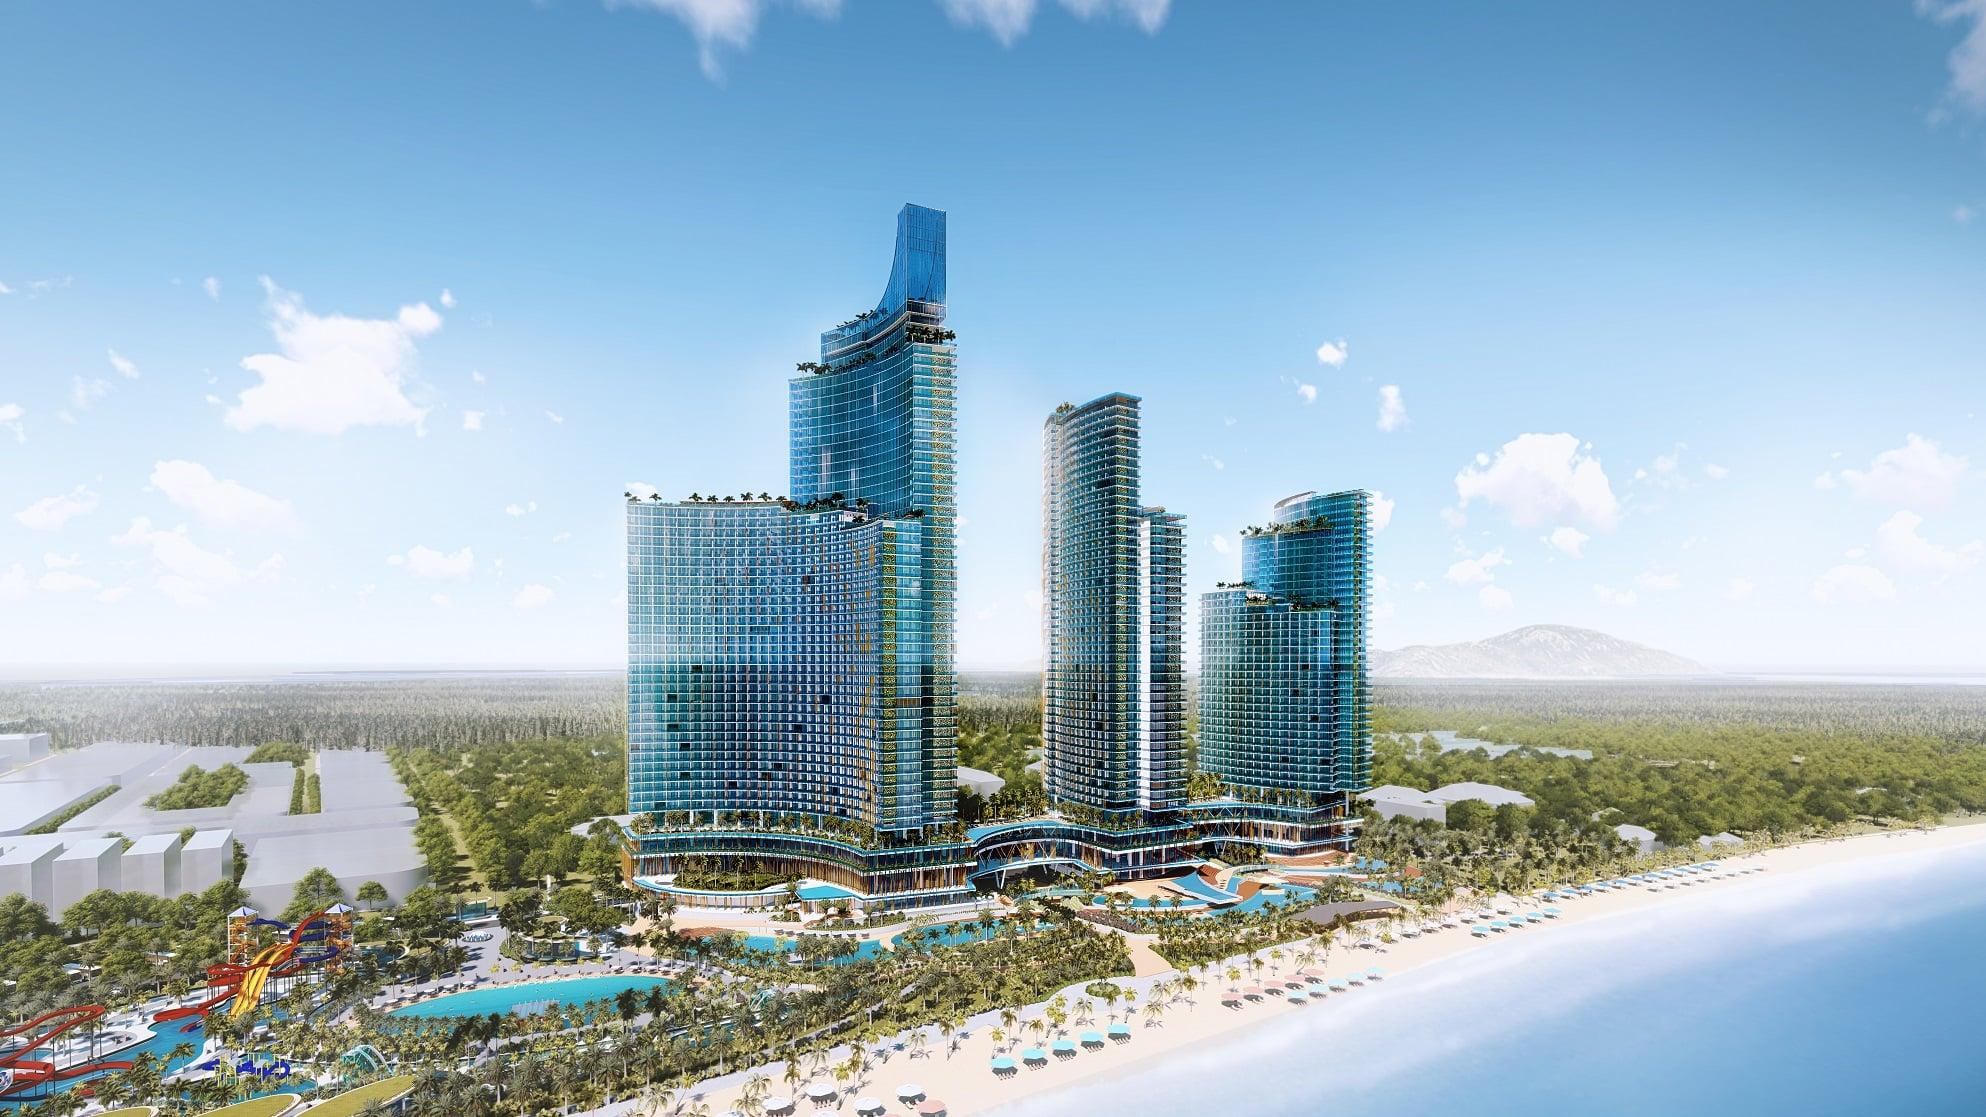 Sunbay Park - DỰ ÁN SUNBAY PARK HOTEL & RESORT PHAN RANG NINH THUẬN